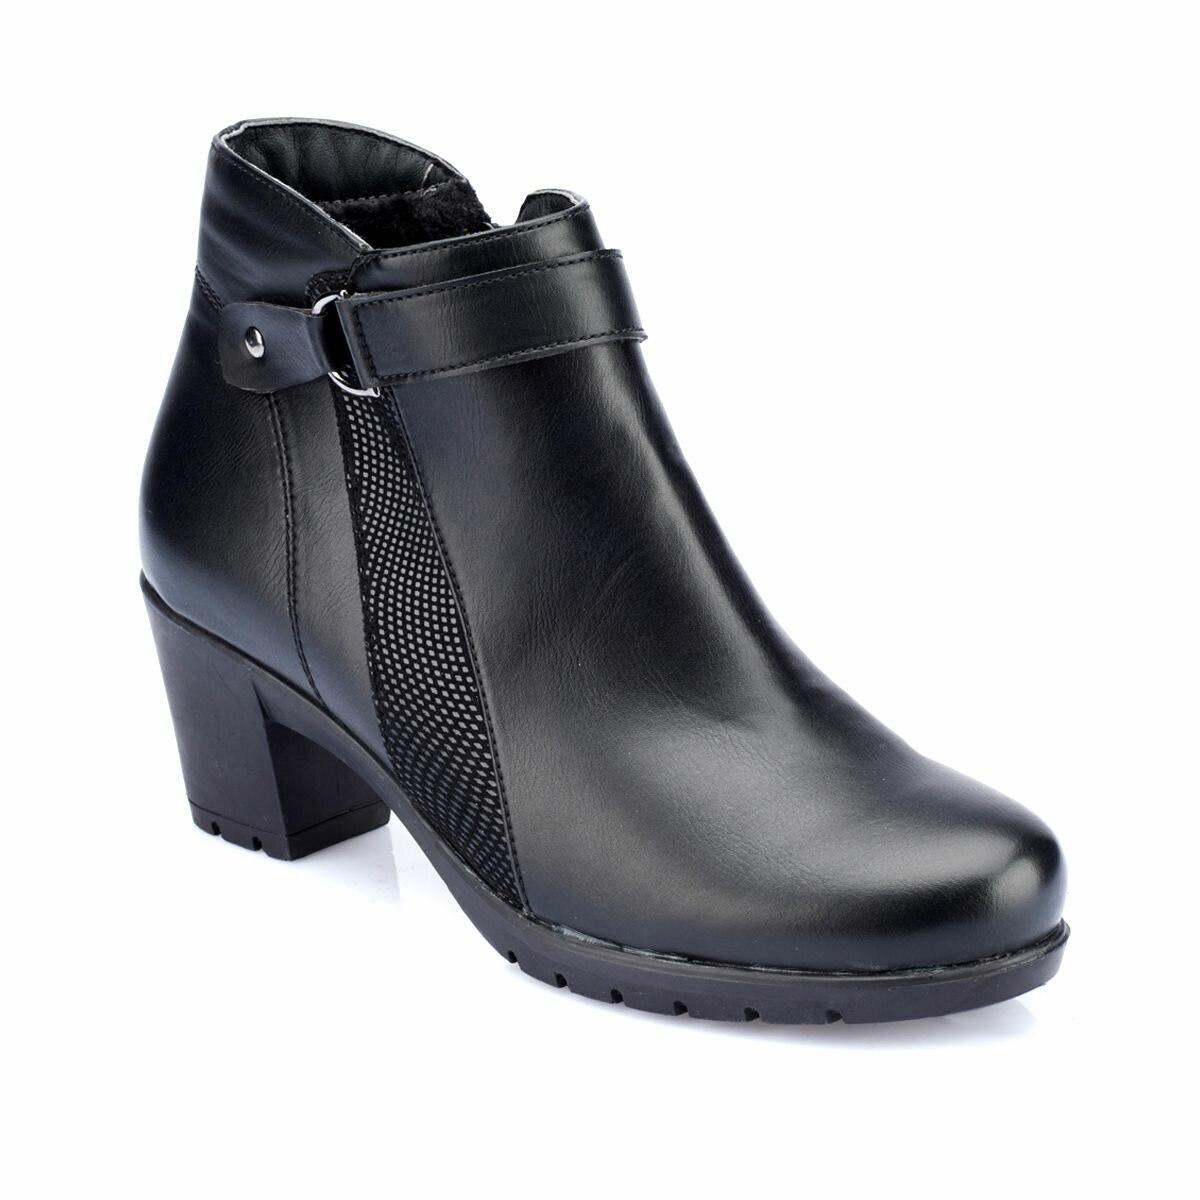 FLO 82. 150315.Z Brown Women 'S Boots Polaris